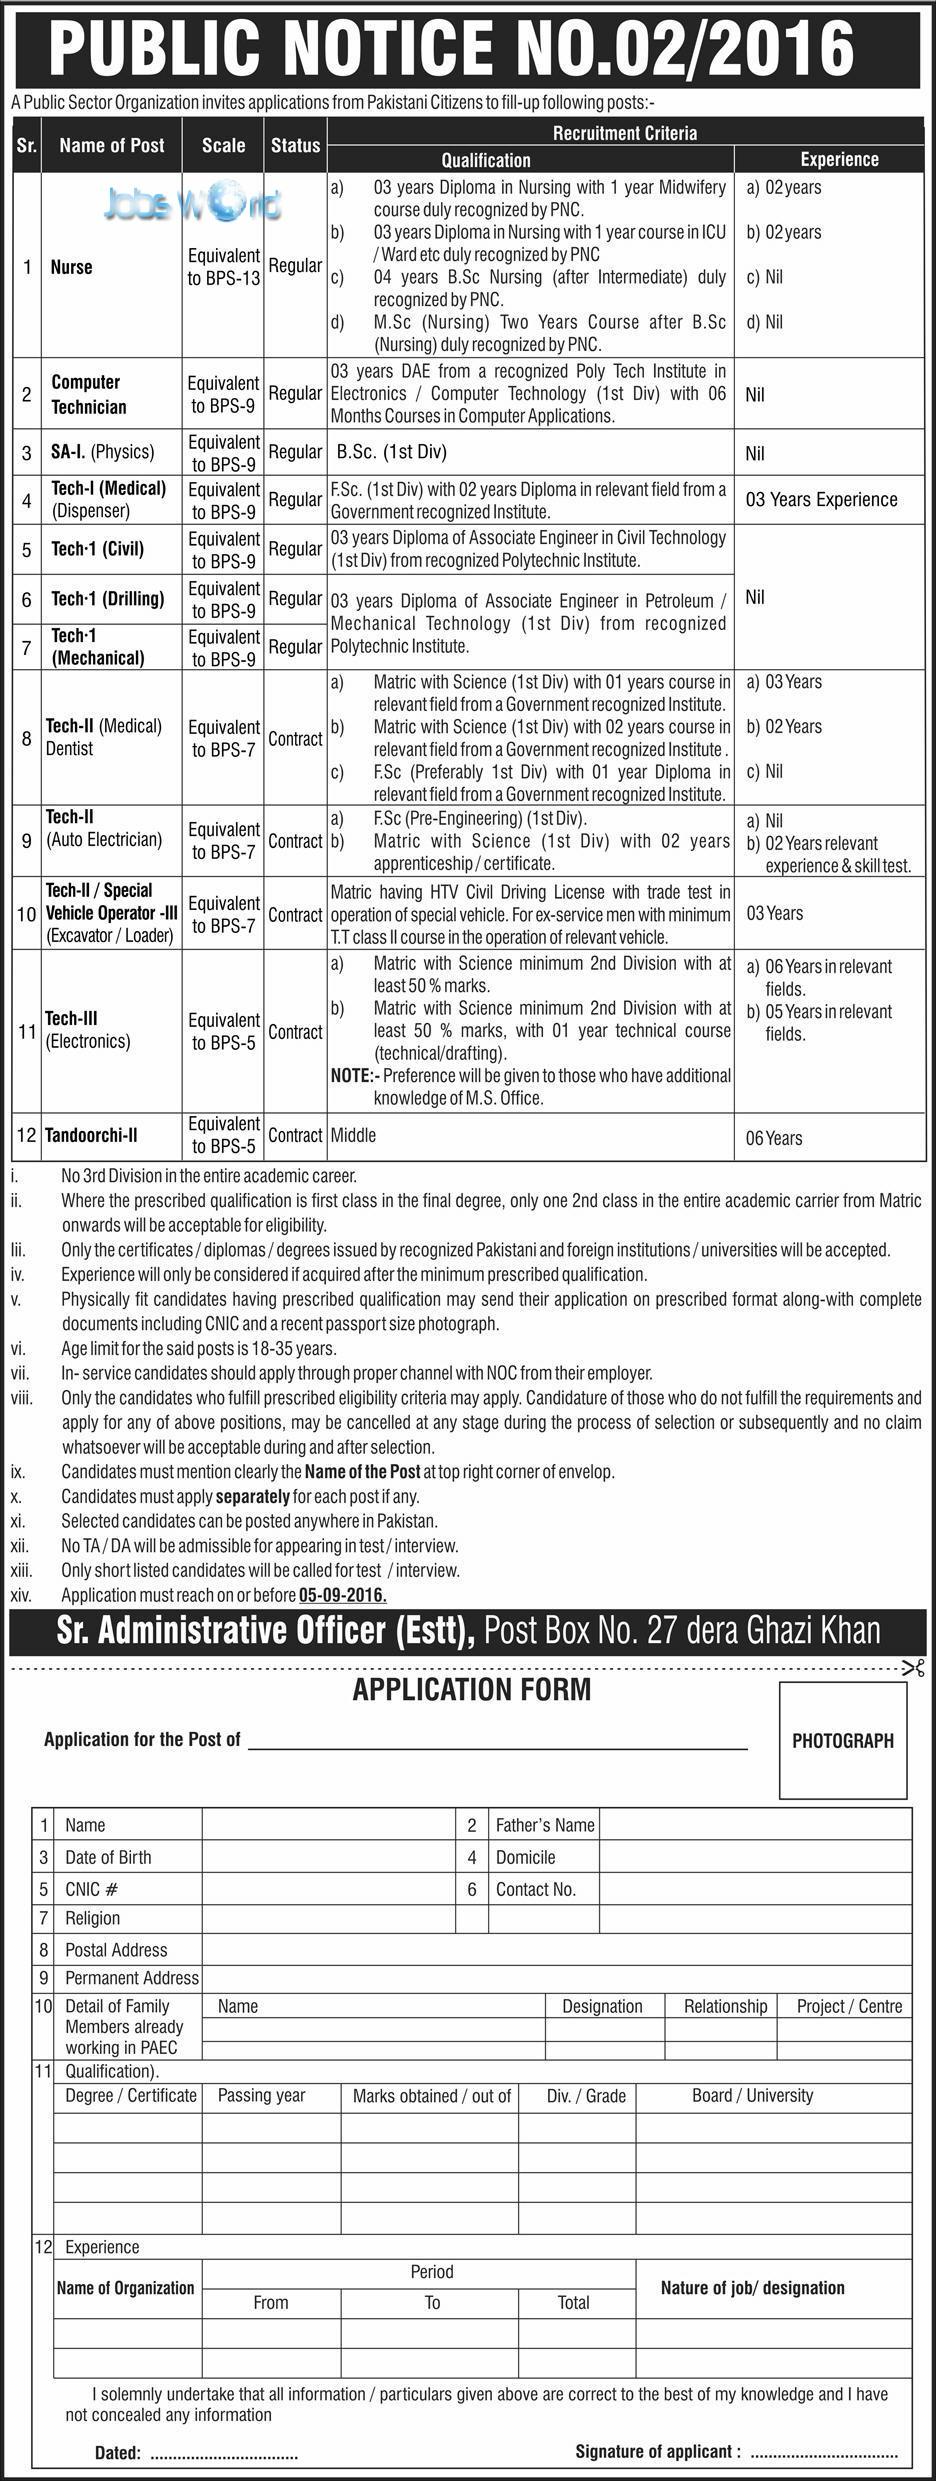 PO Box 27 Jobs 2016 Dera Ghazi Khan PAEC Application Form